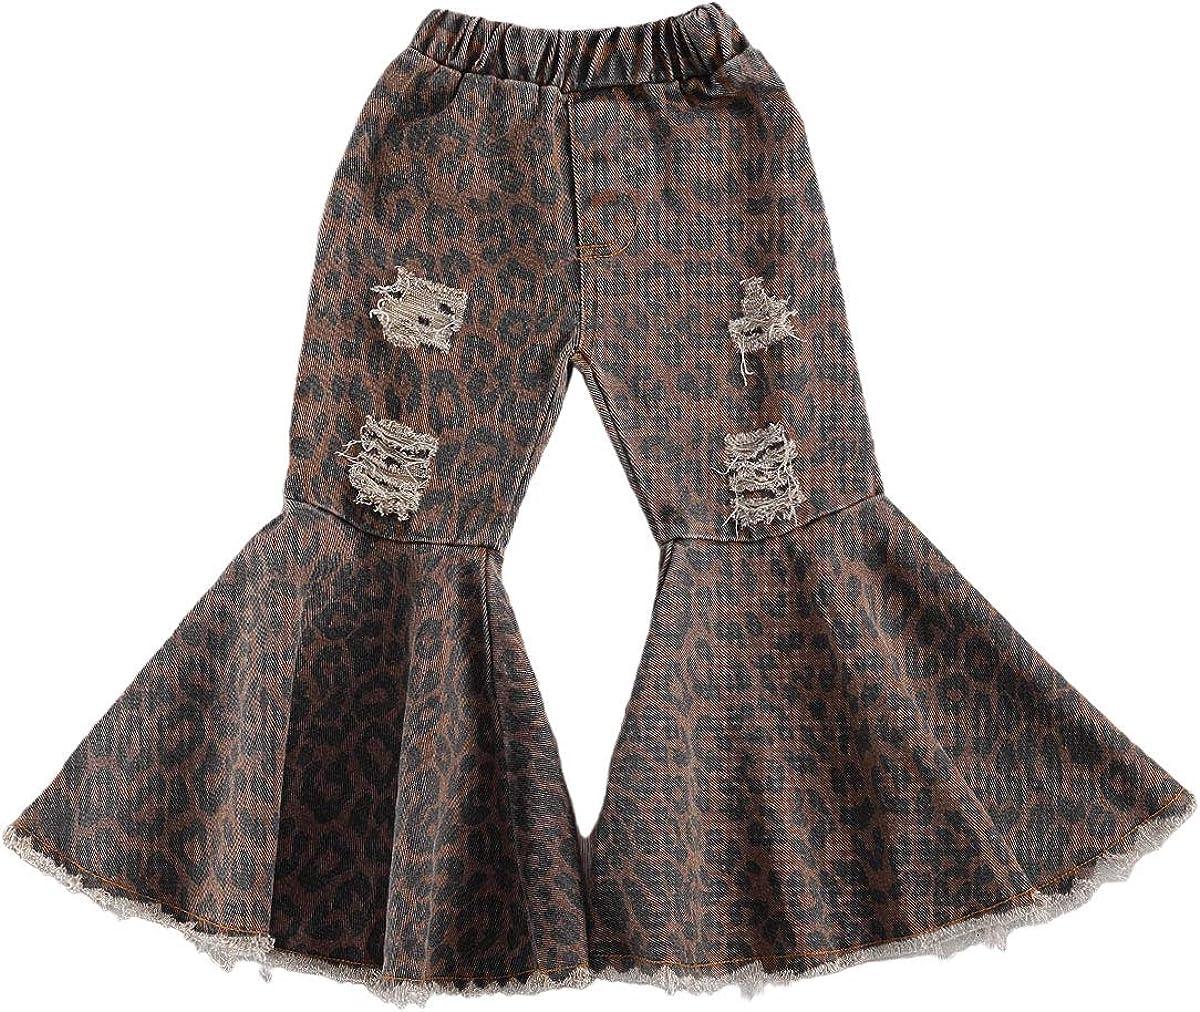 OAKFashion Toddler Little Kid Girls Ruffle Leggings Leopard Print Bell Bottom Flare Pants Girls Stretchy Trousers 2-7T